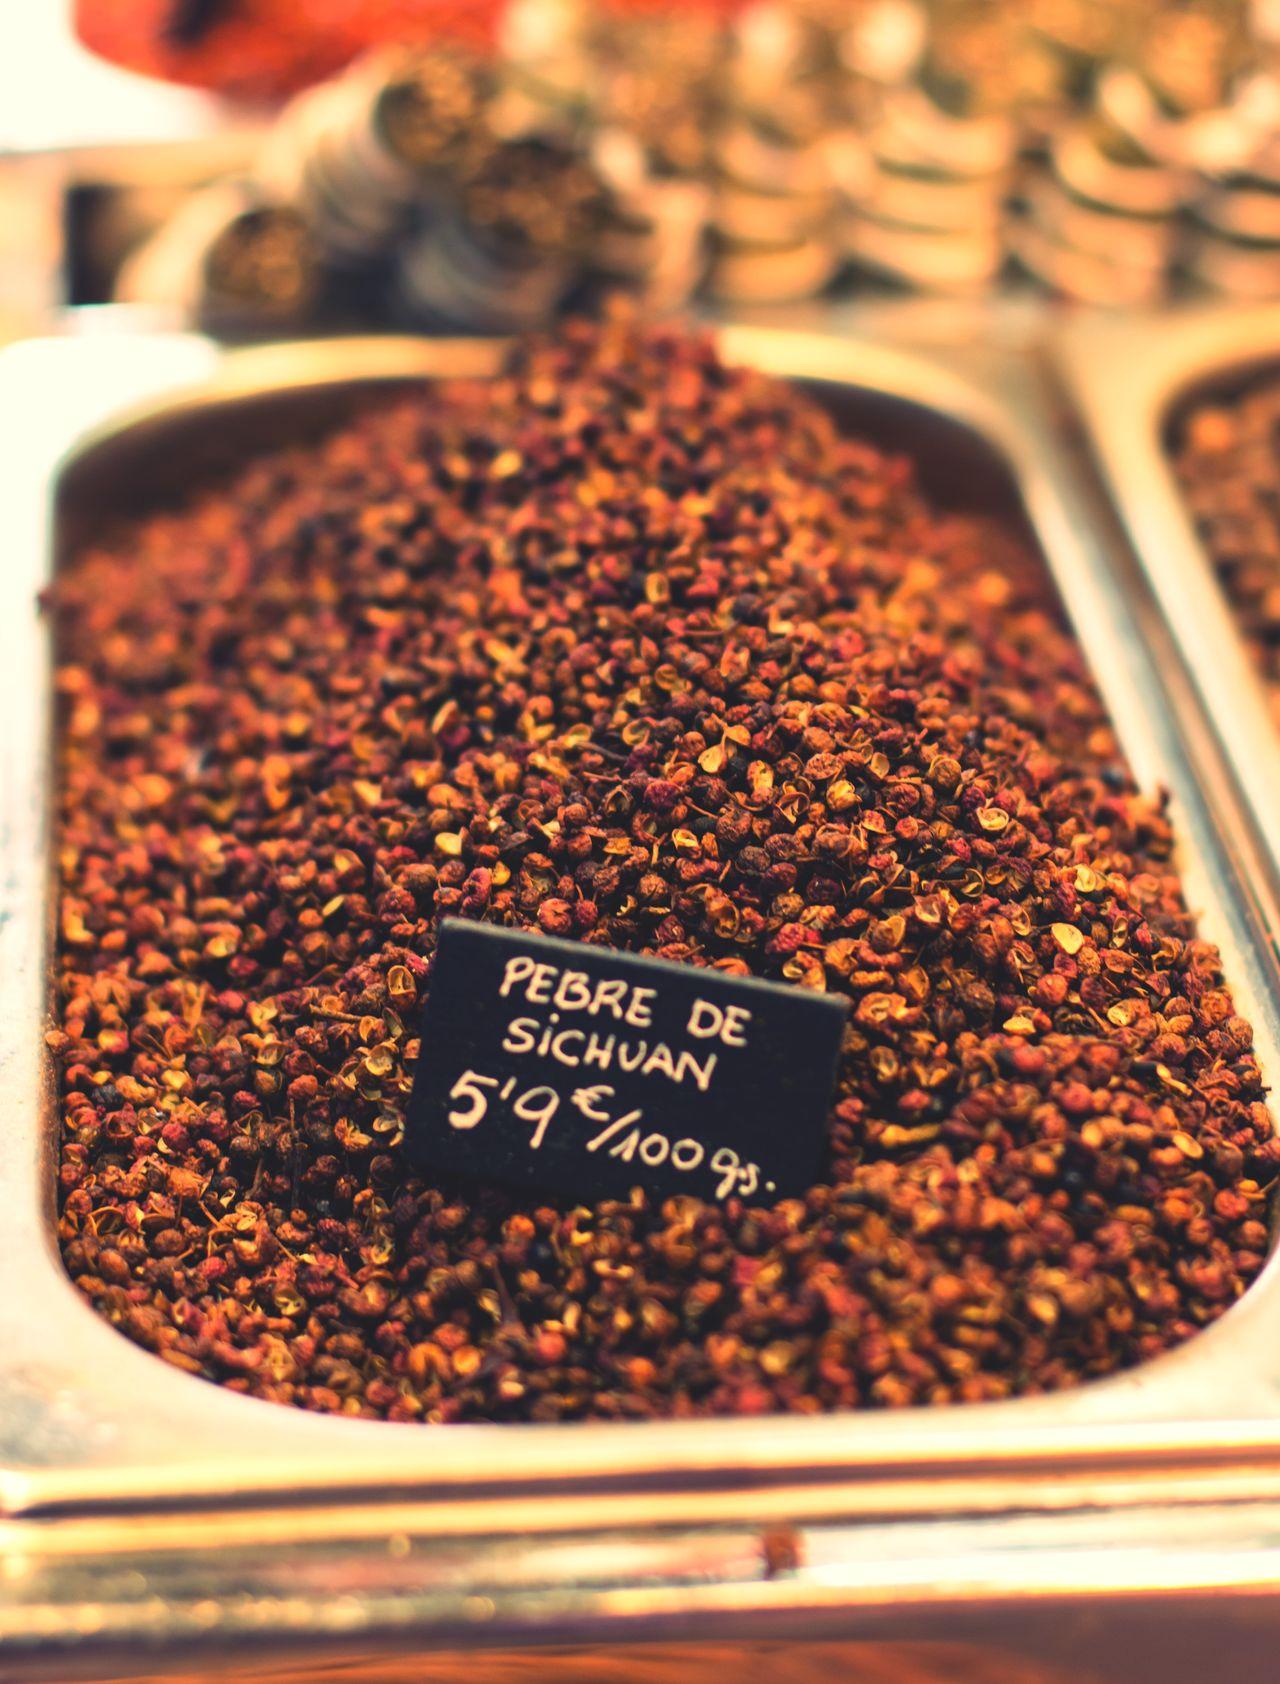 Pebre De Chichuan Poivre Peppercorns The Shop Around The Corner